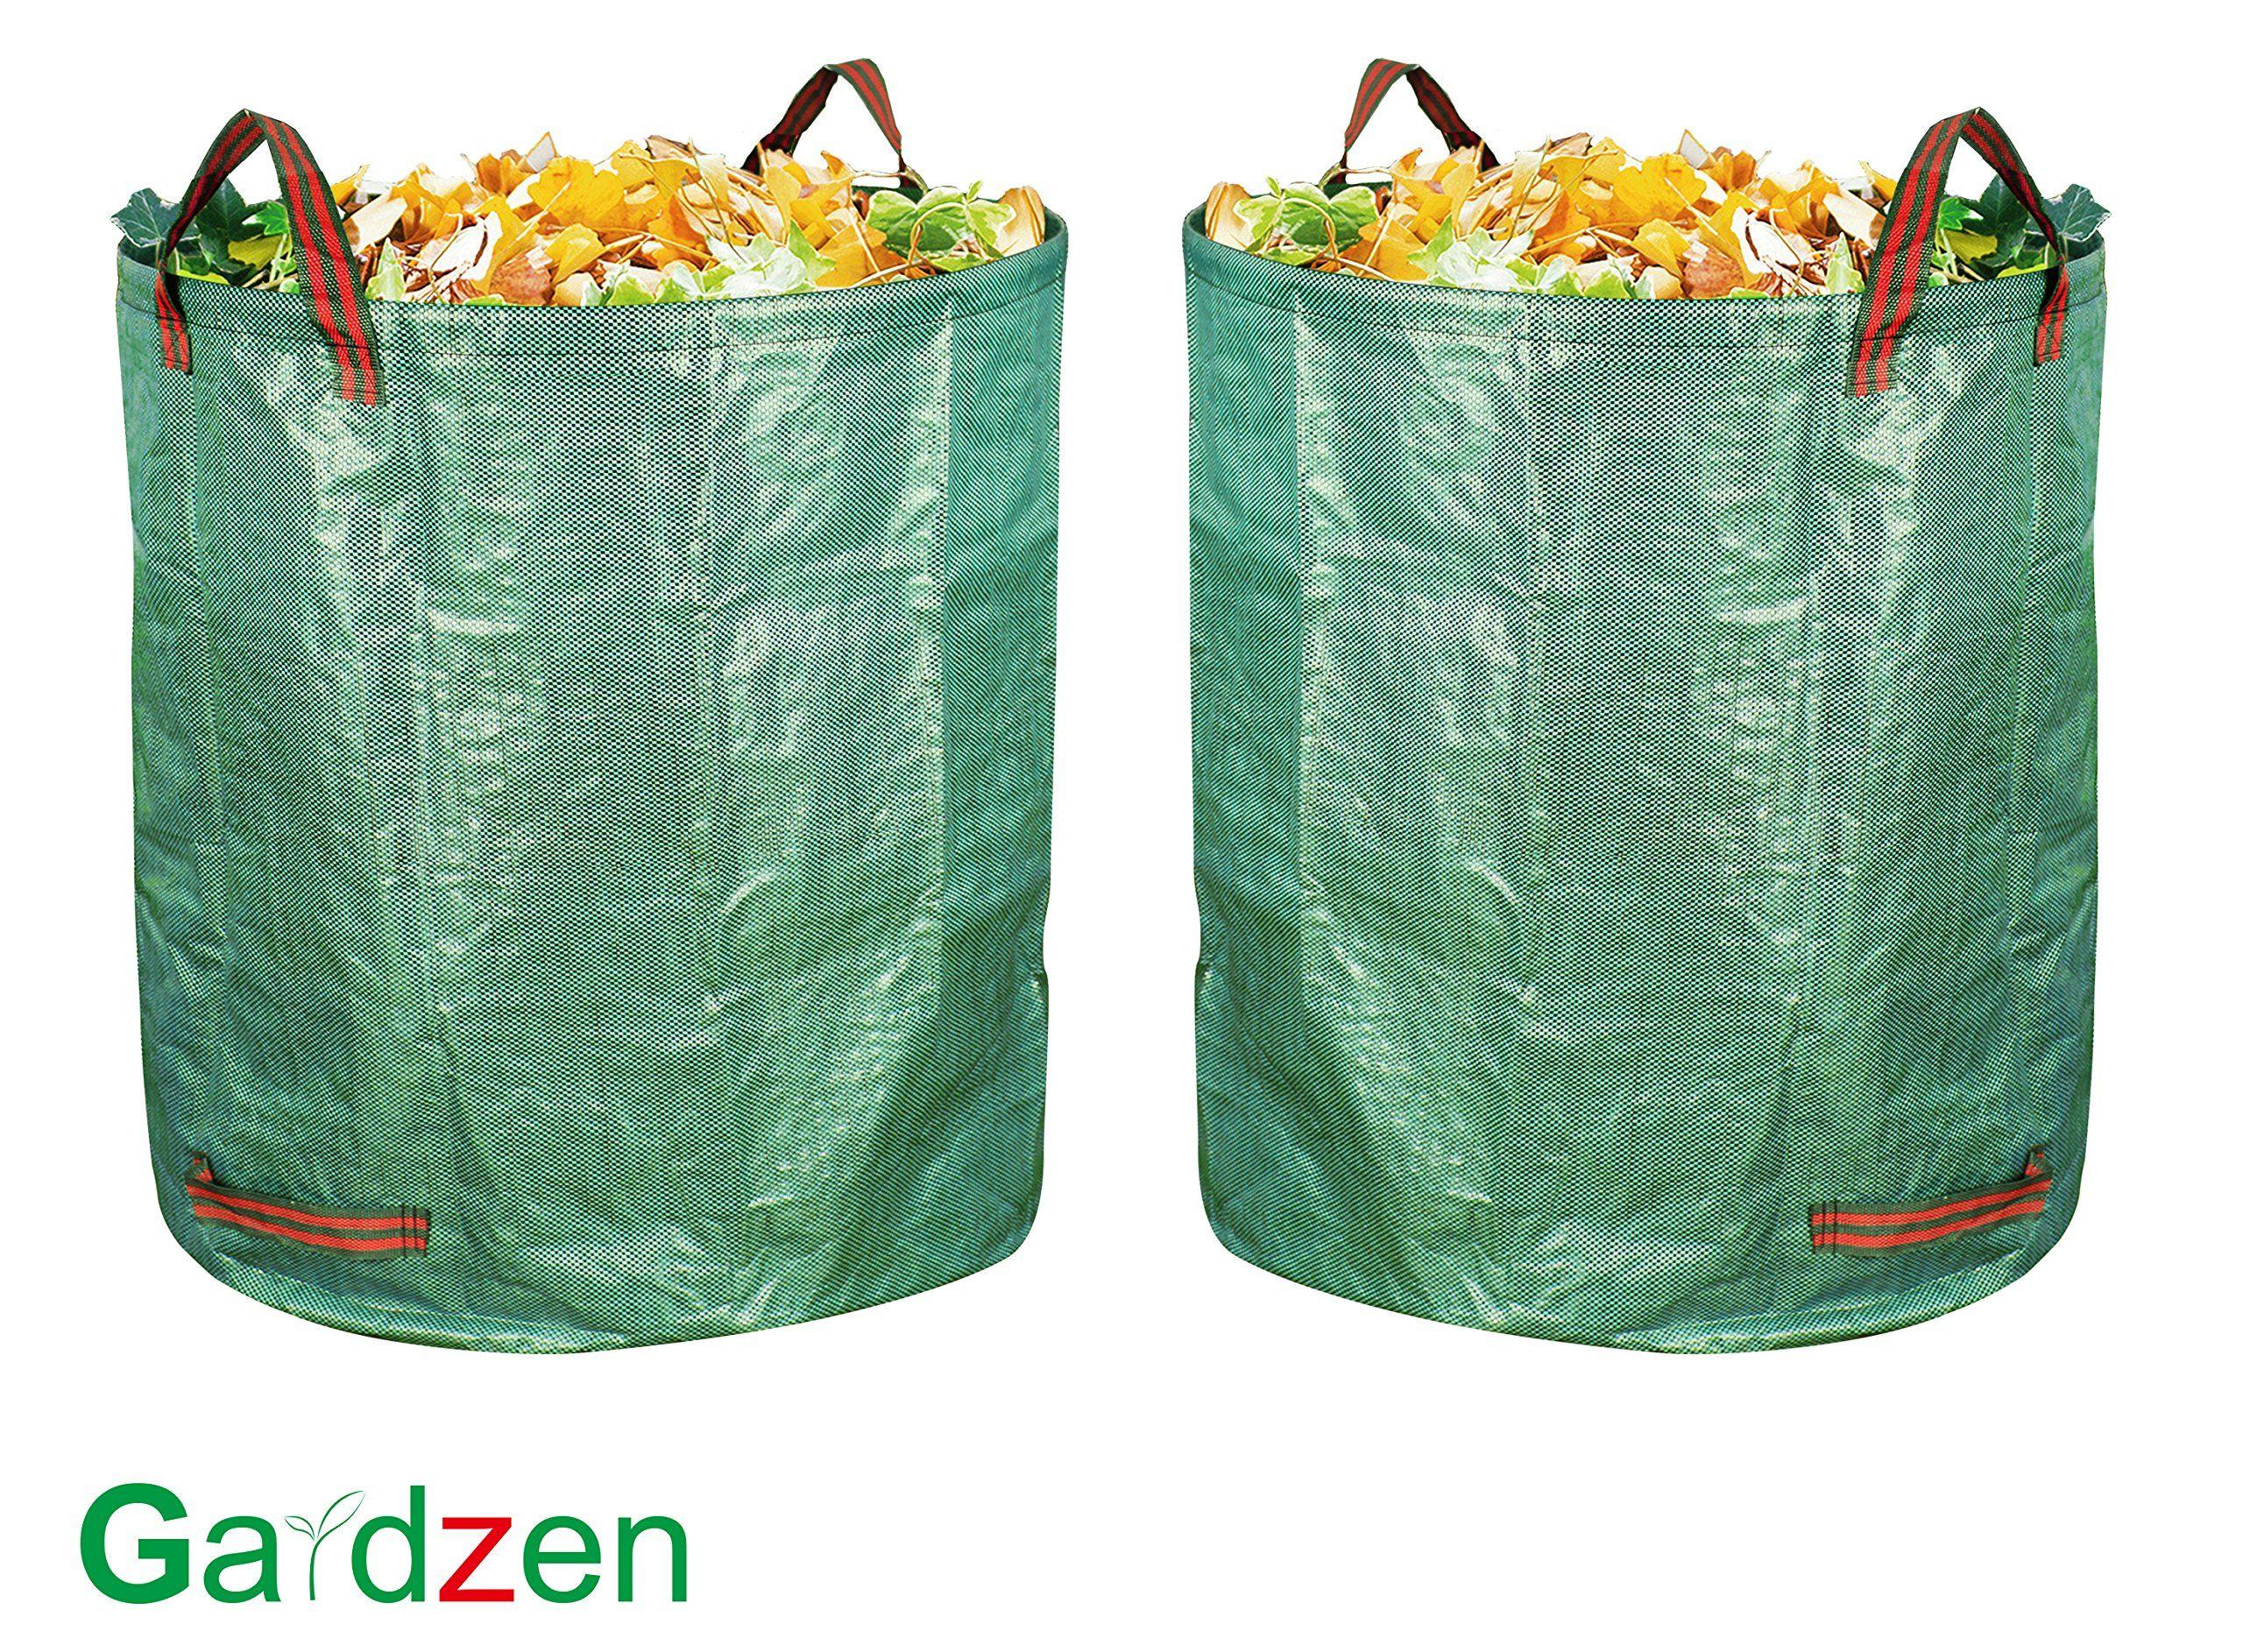 Gardzen 2pack 132 Gallons Gardening Bag With Gloves Extra